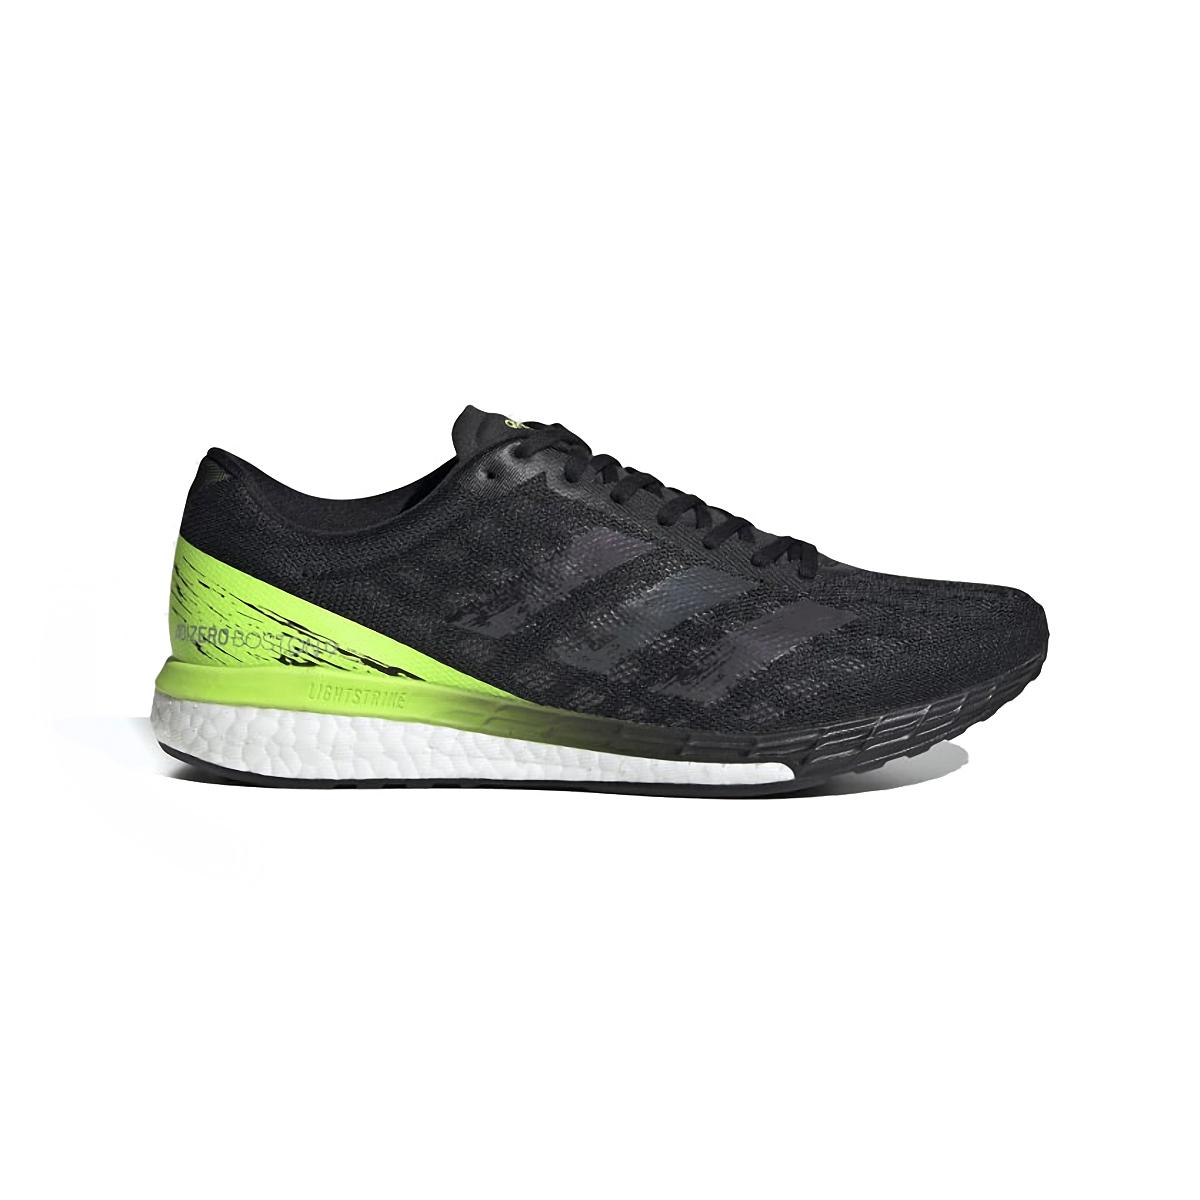 Men's Adidas Adizero Boston 9 Running Shoe - Color: Core Black/Core - Size: 6.5 - Width: Regular, Core Black/Core, large, image 1